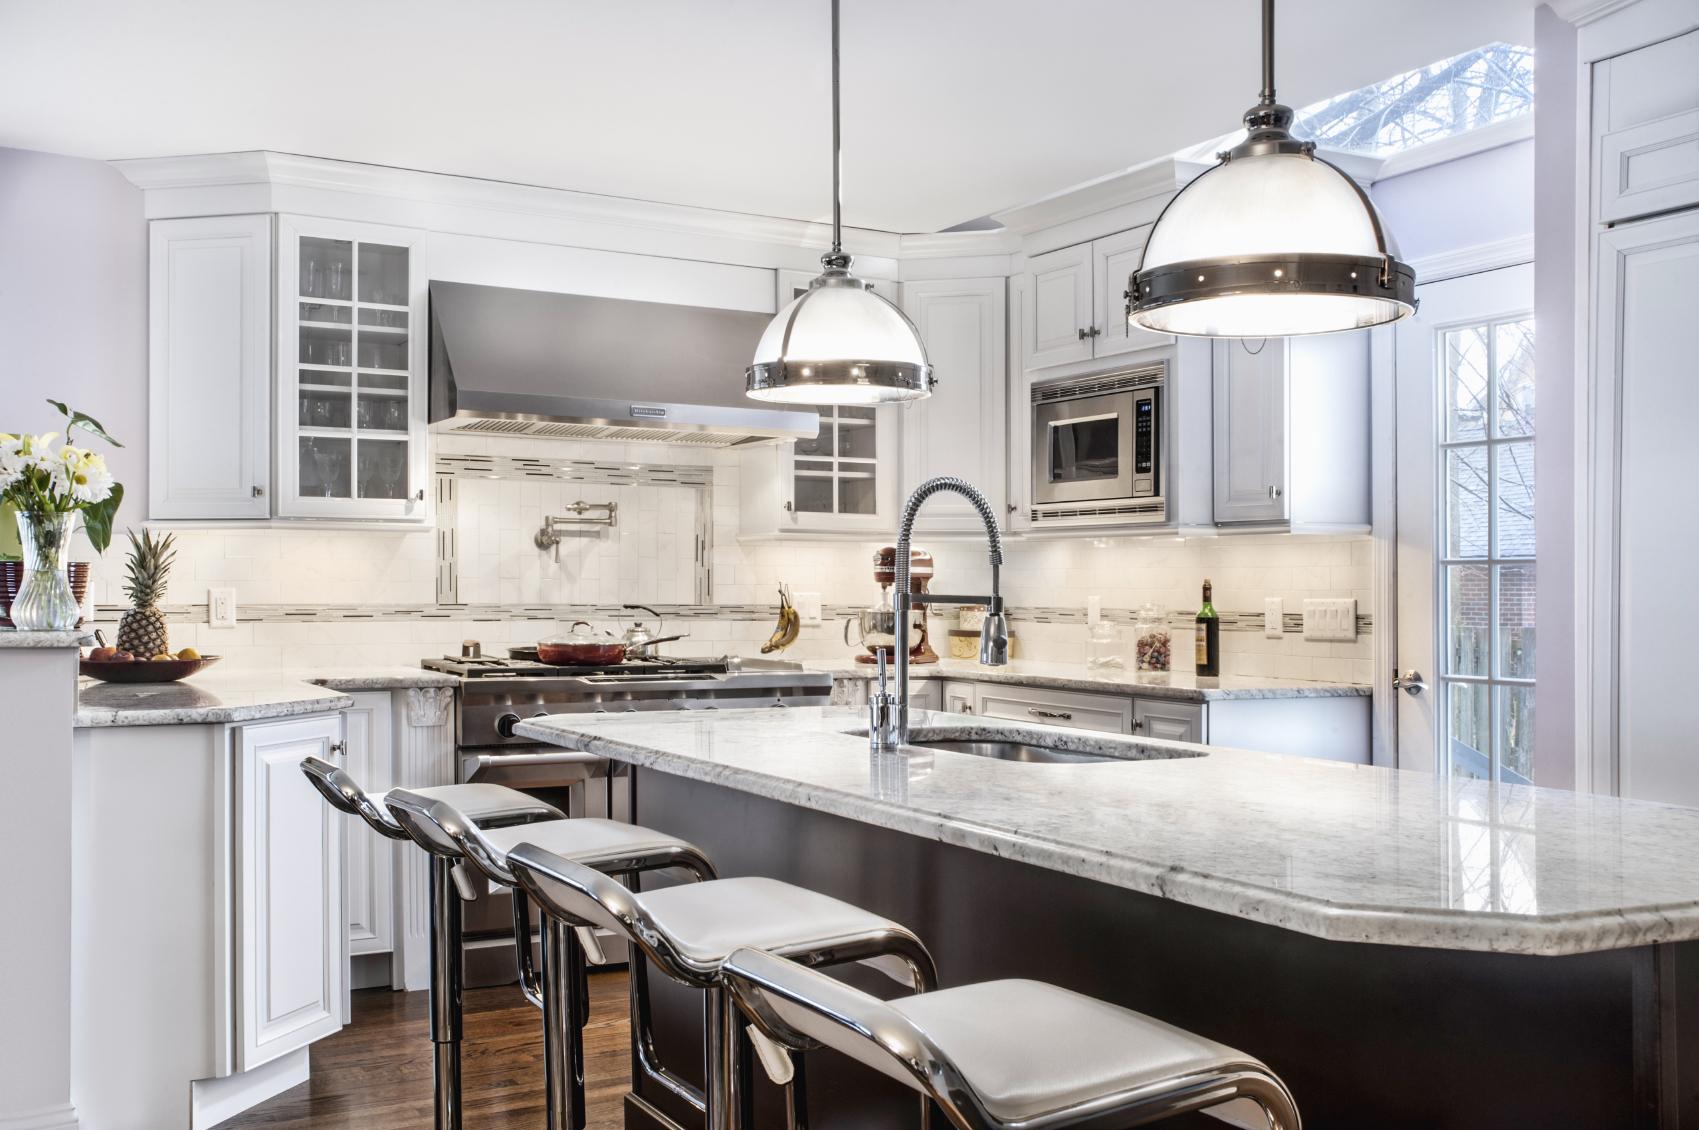 5 Fast Kitchen Update Ideas - Dianella Polishing